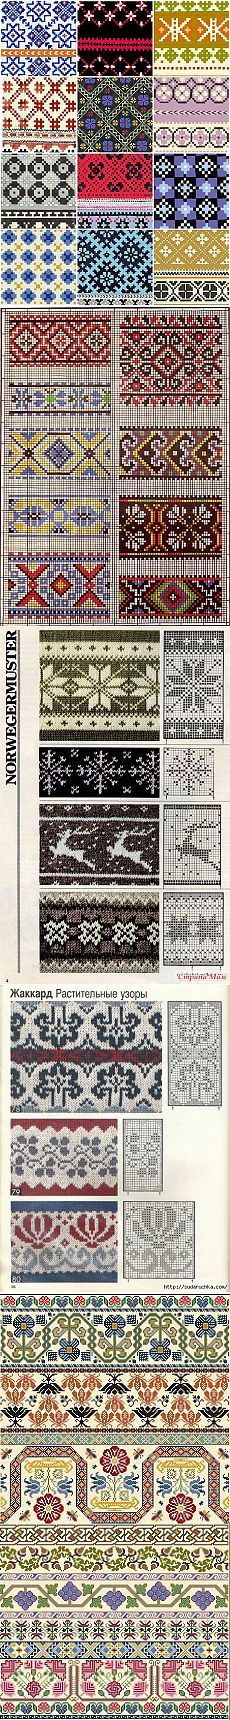 Incredible colorwork stitch pattern inspiration